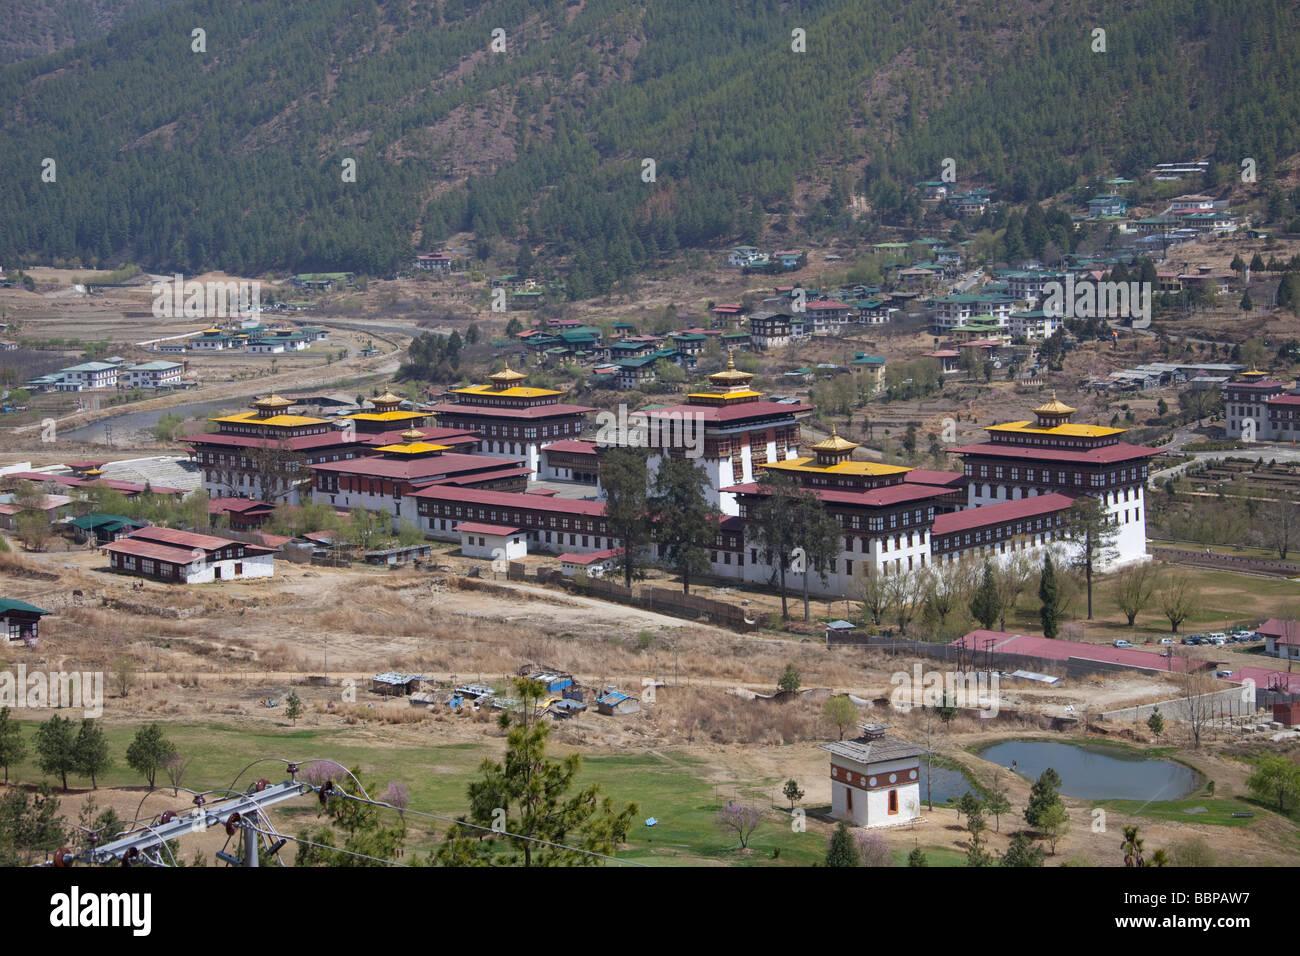 Palais Royal du Roi du Bhoutan building Tashi Chho Dzong Thimphu 91074_Bhutan-Thimphu Photo Stock